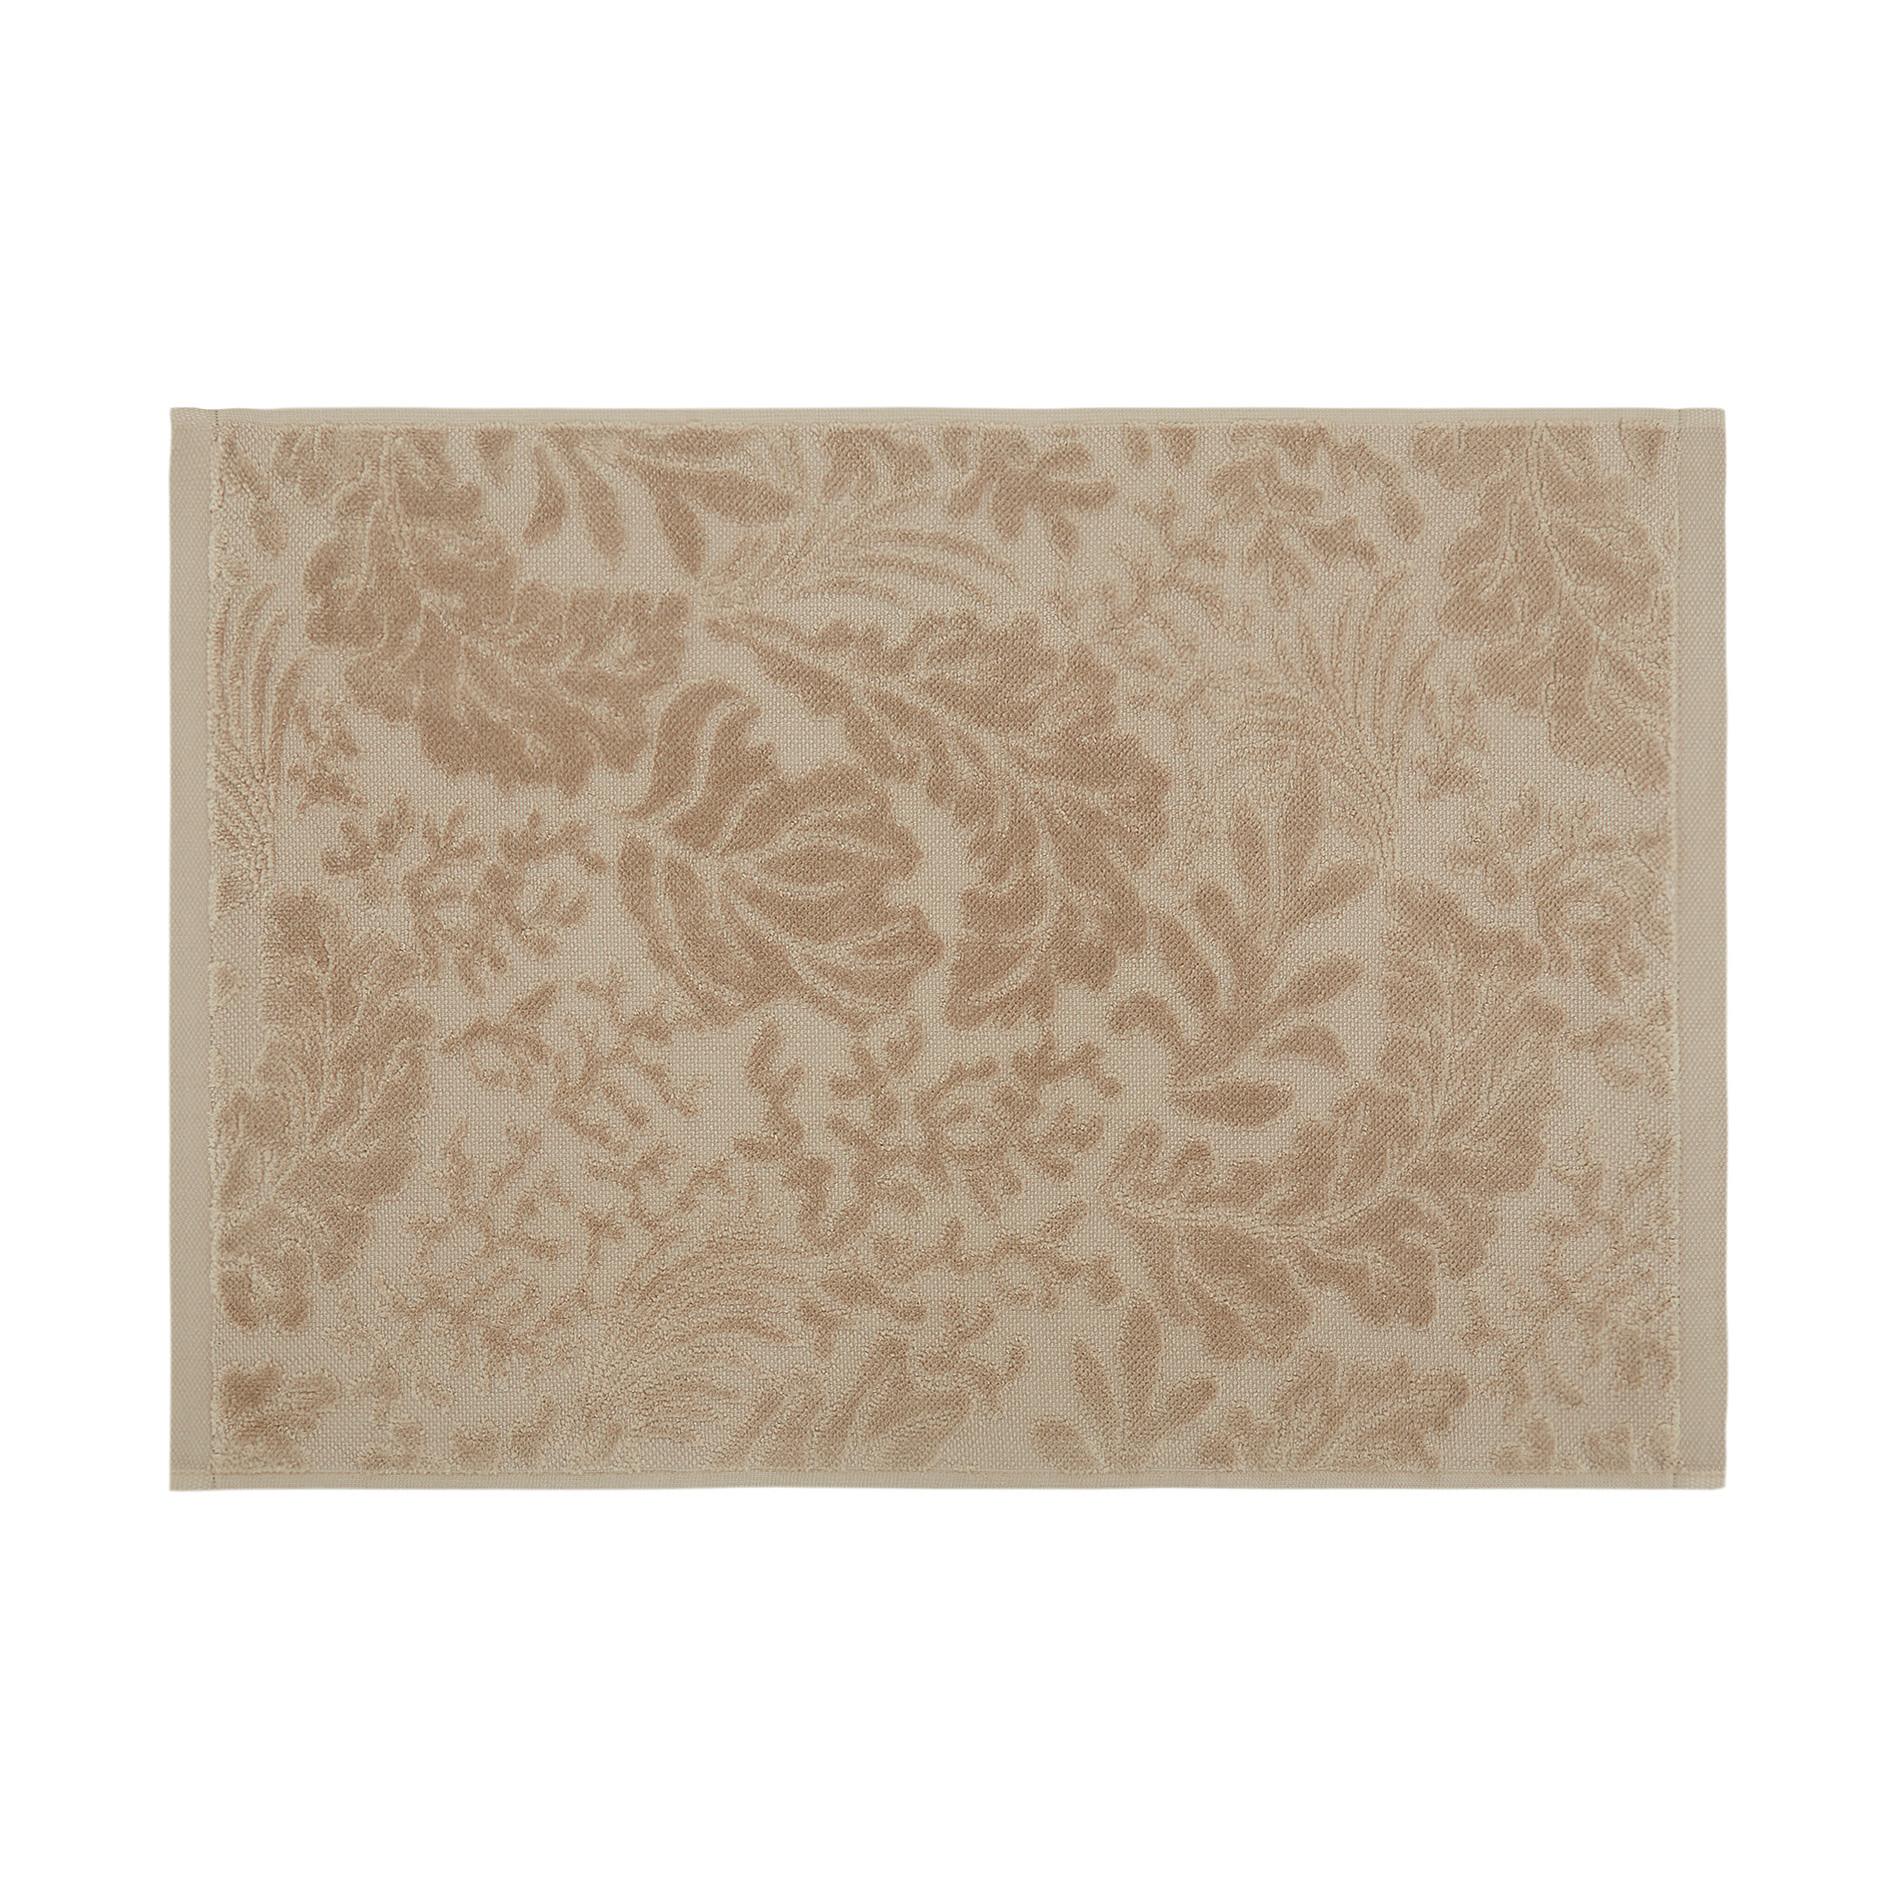 Asciugamano cotone velour motivo coralli, Beige, large image number 1